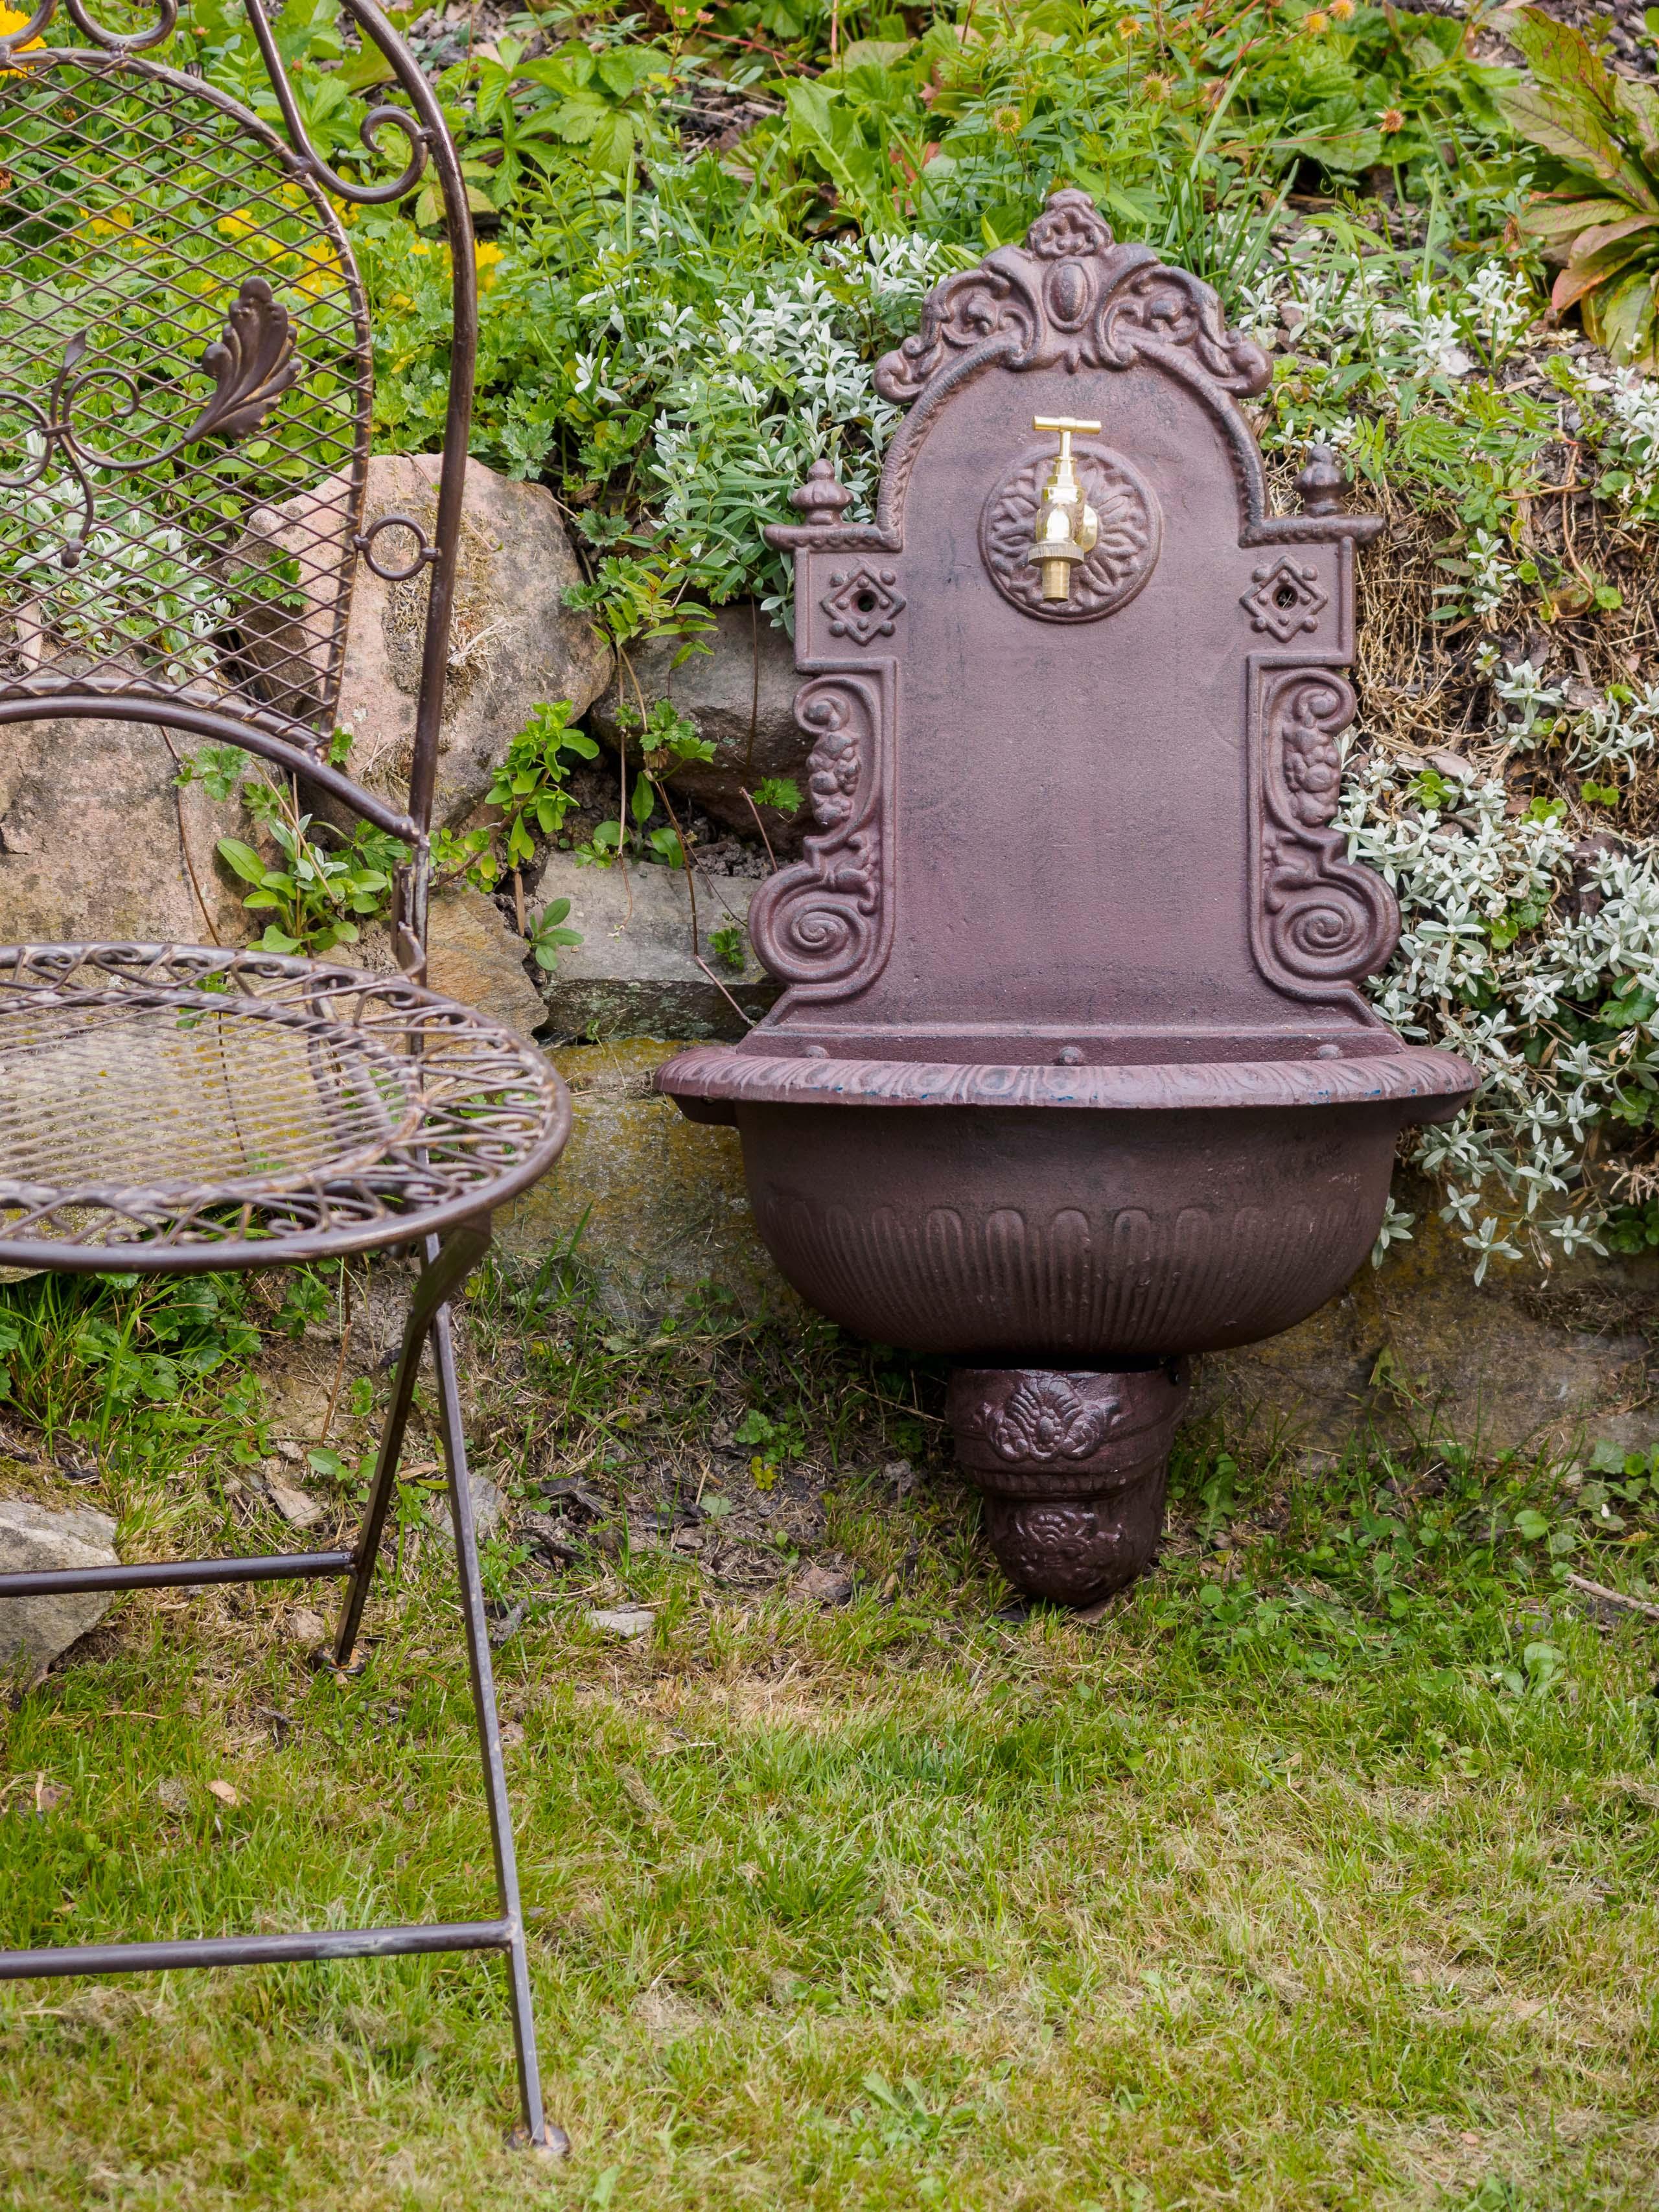 Waschbecken Wandbrunnen Garten Eisen Gründerzeit Antik Stil Brunnen